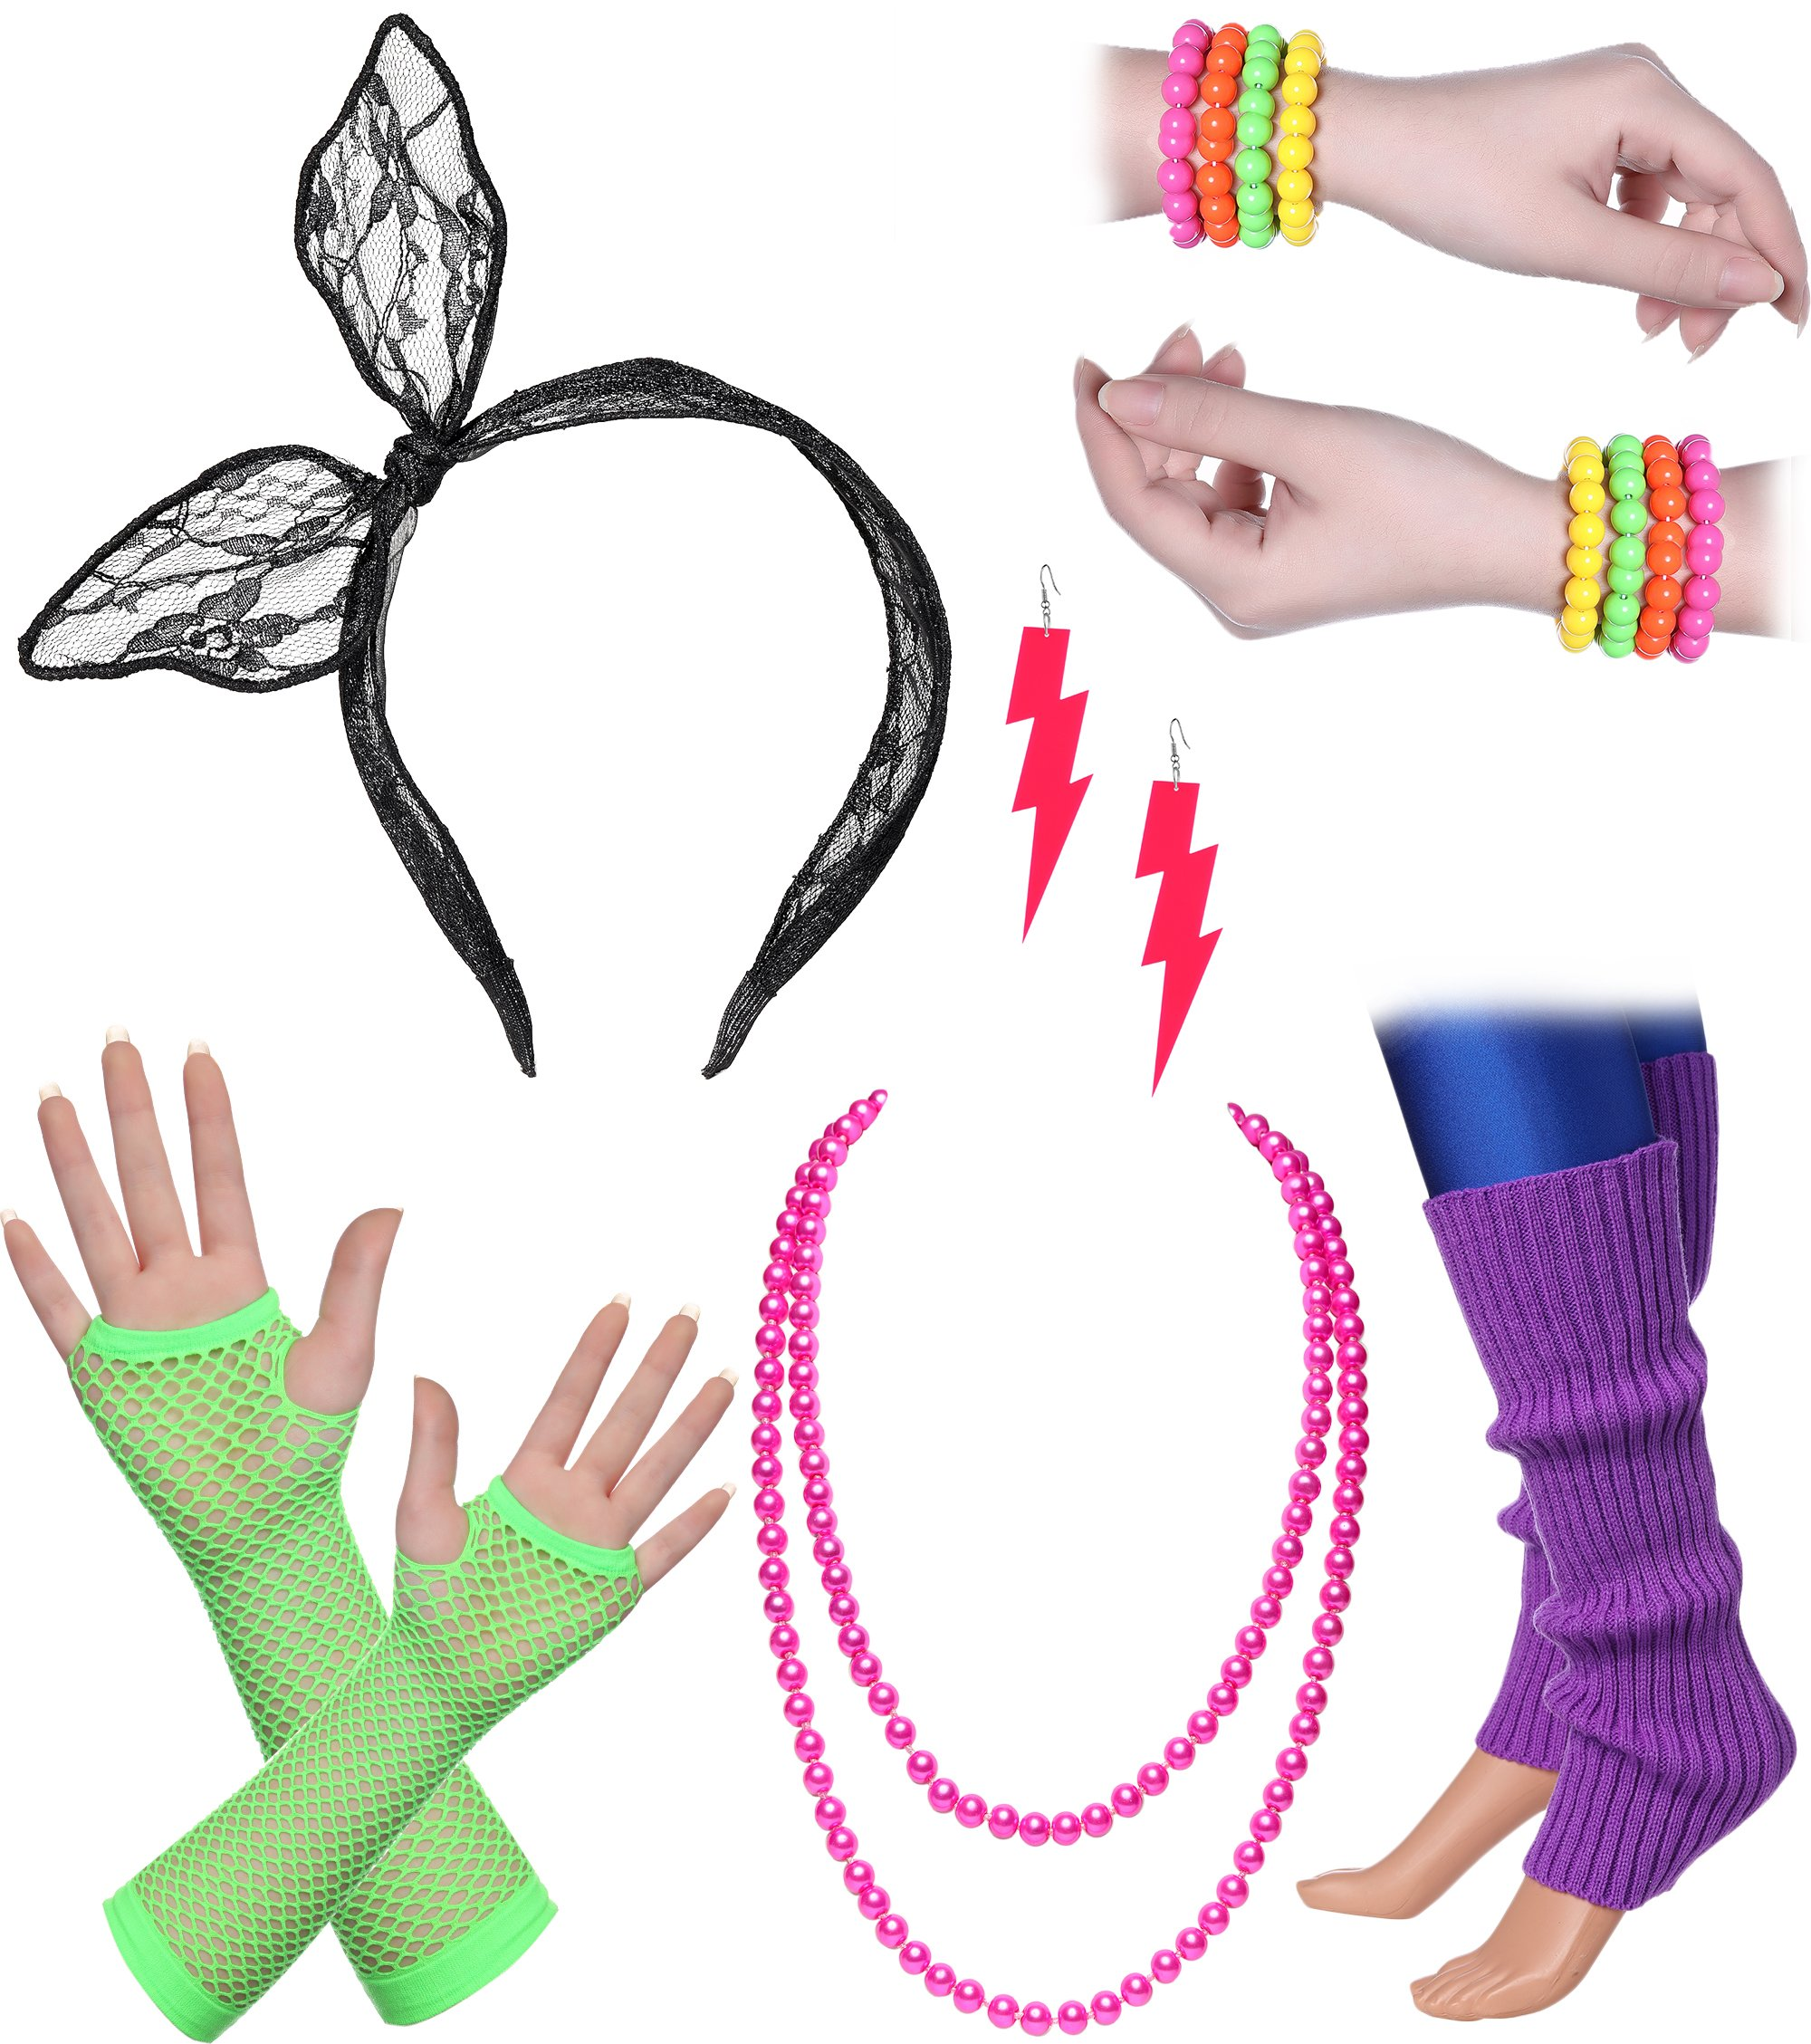 BABEYOND 80s Outfit Costume Accessories Neon Earrings Fishnet Gloves Leg Warmers Headband Bracelets (Set 11)